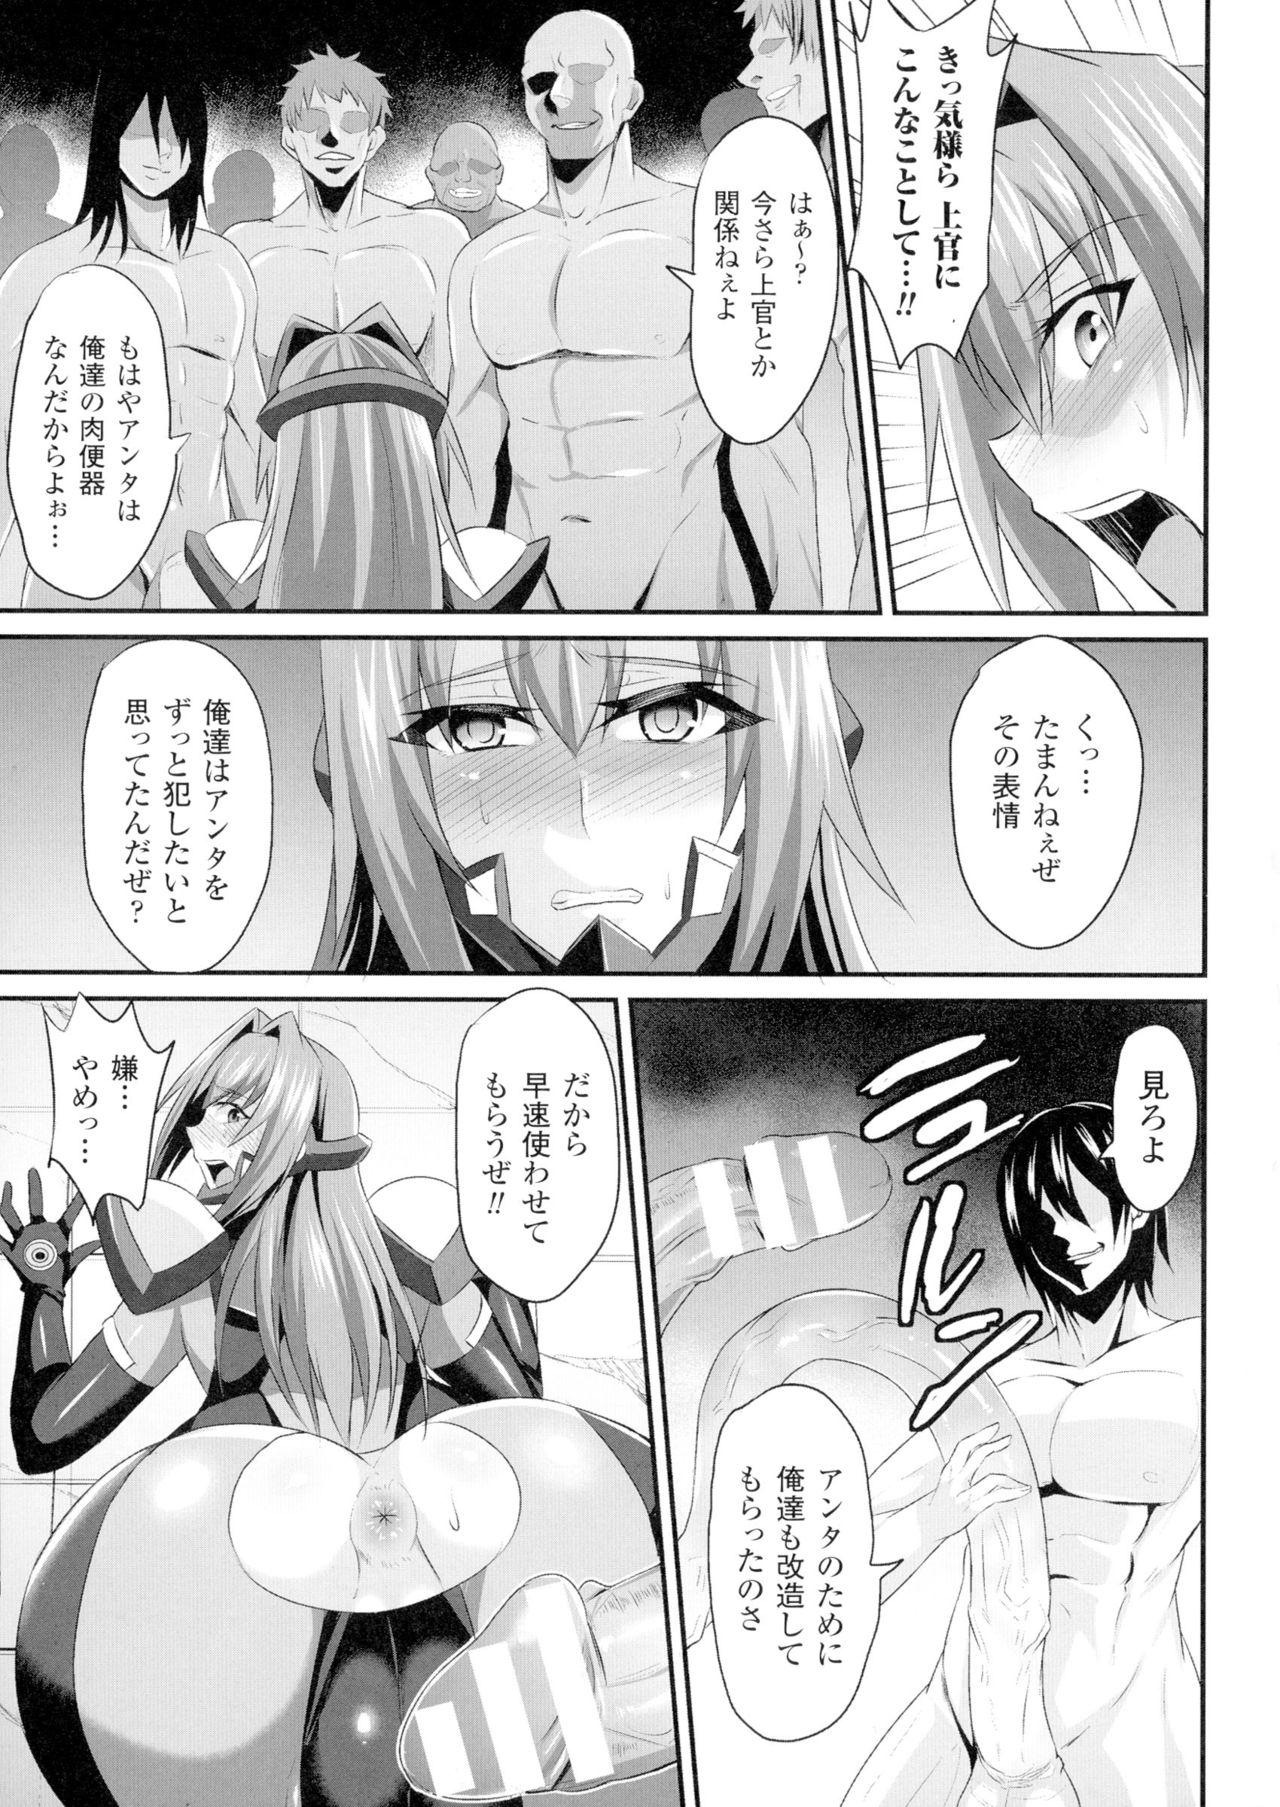 Seigi no Heroine Kangoku File DX Vol. 1 160